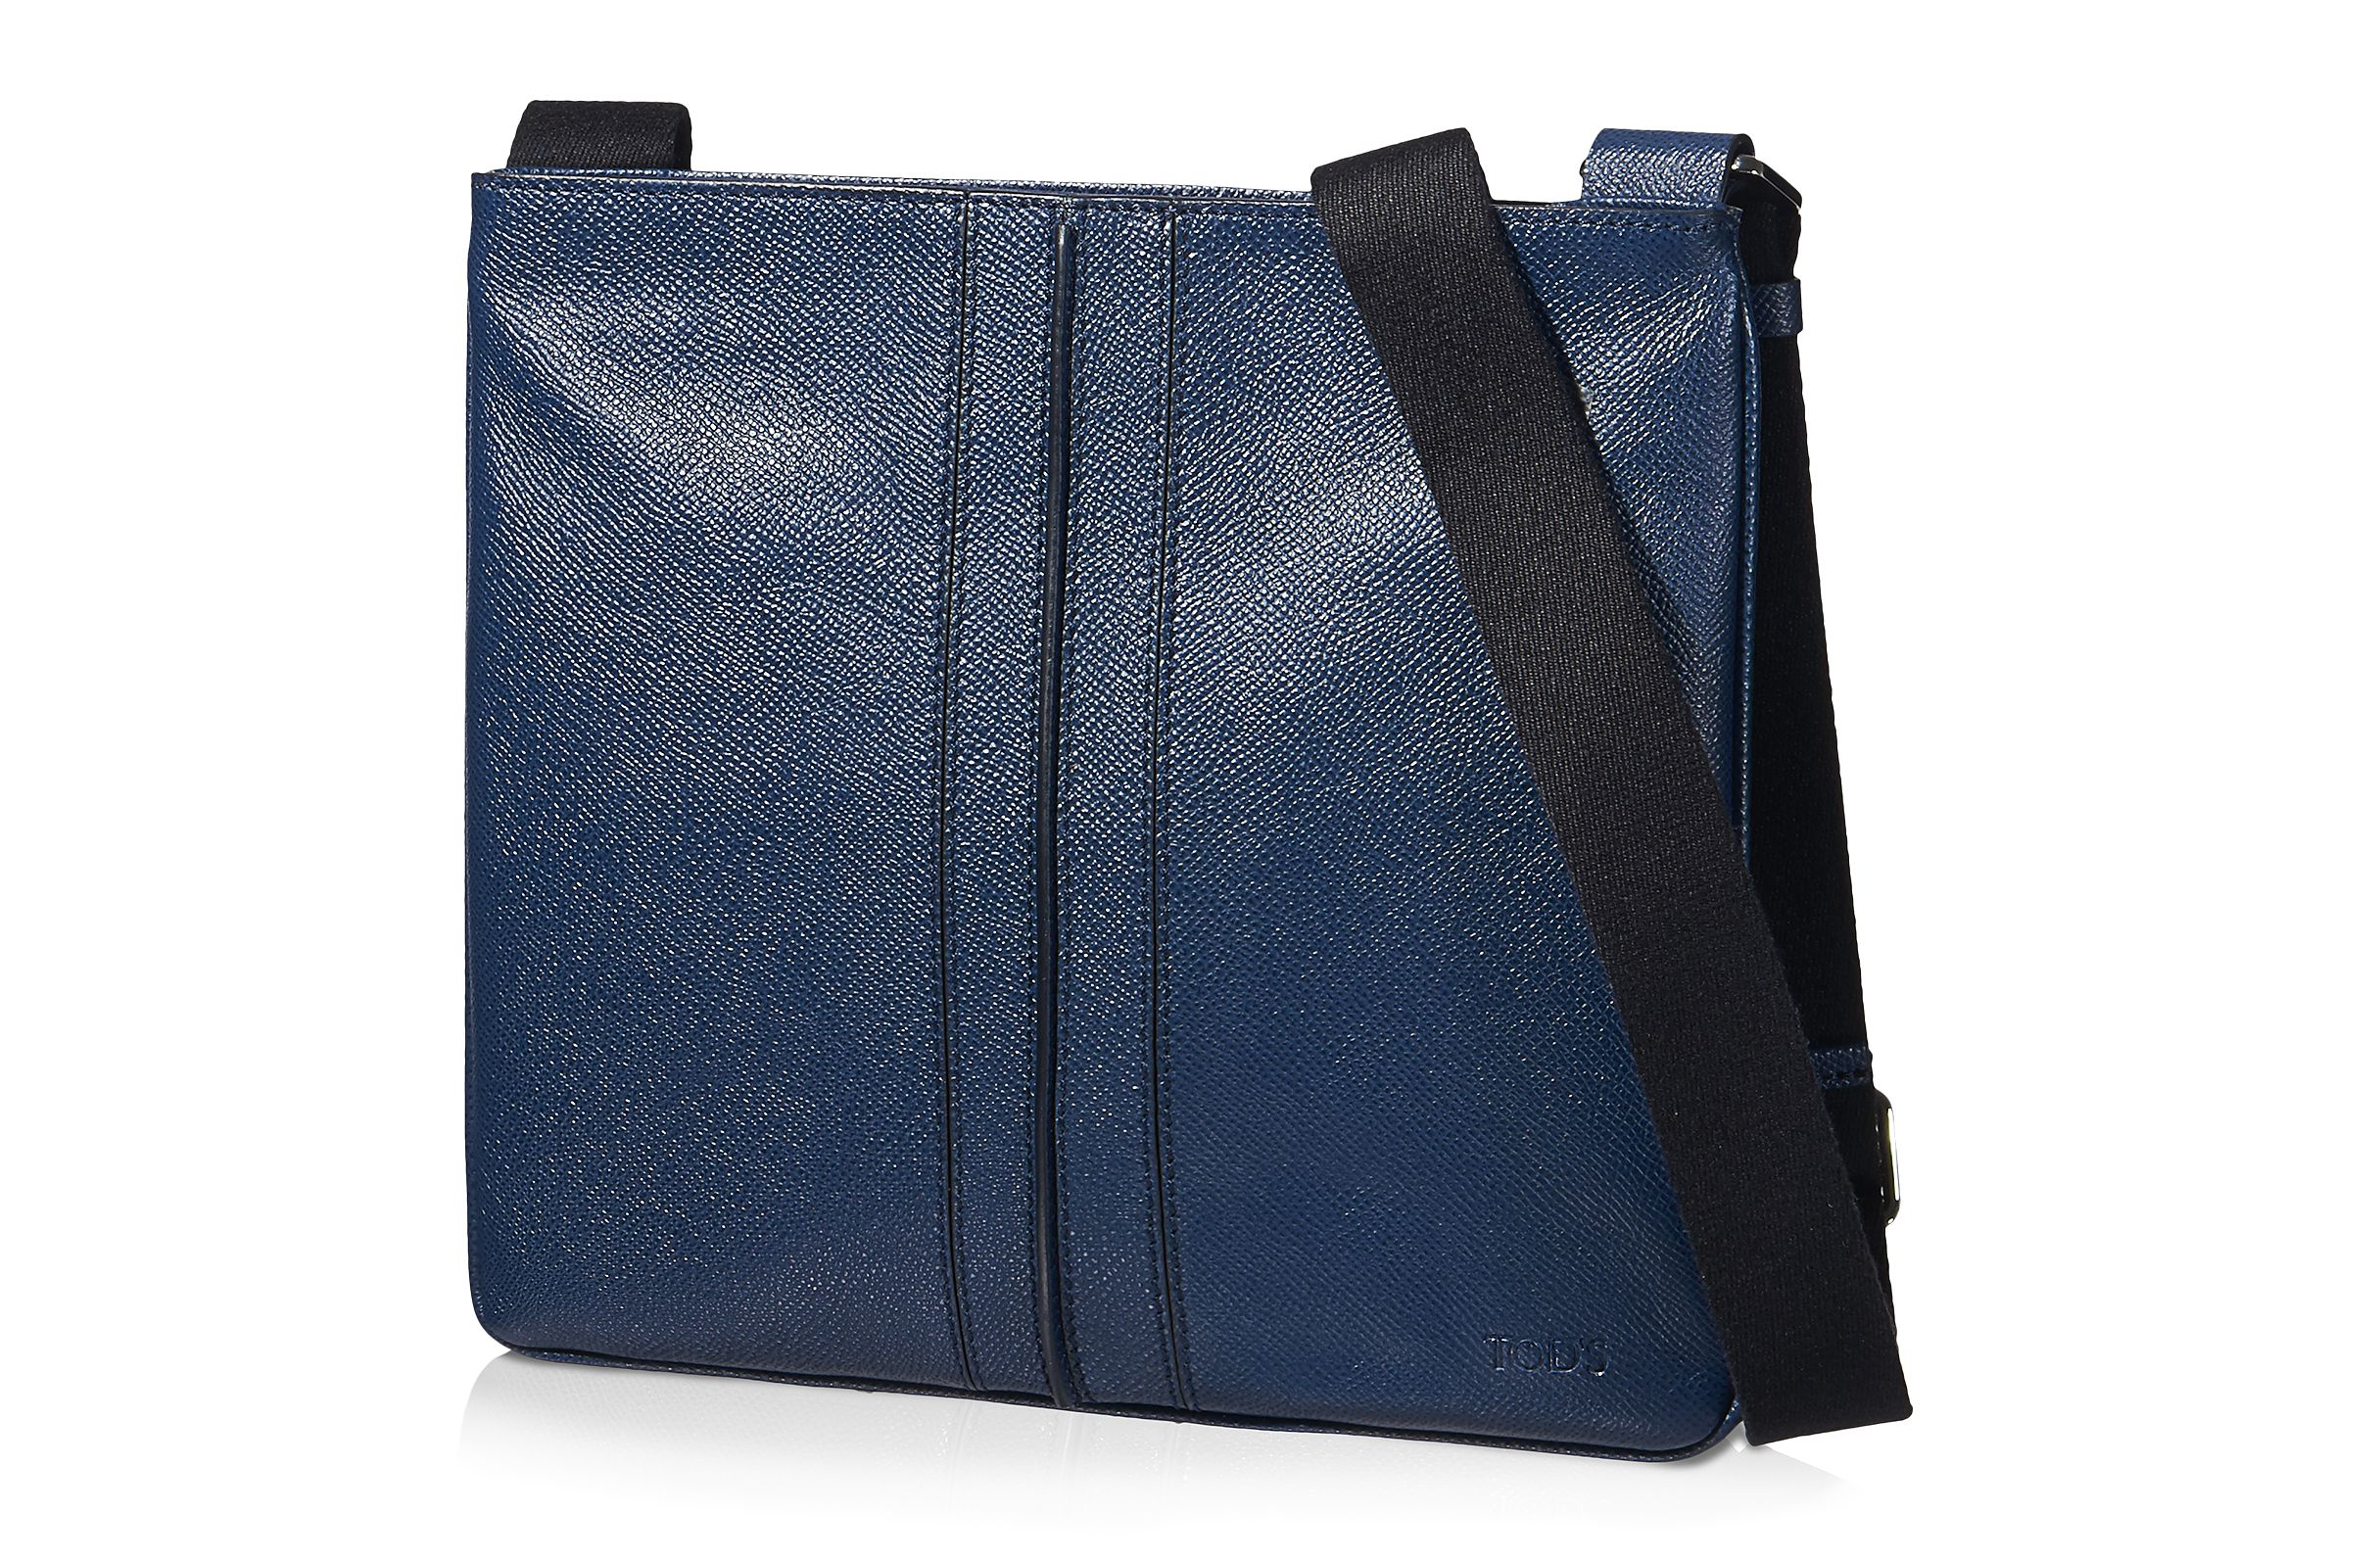 Leather Reporter Bag Fall-Winter 6e65bfba3f3d2